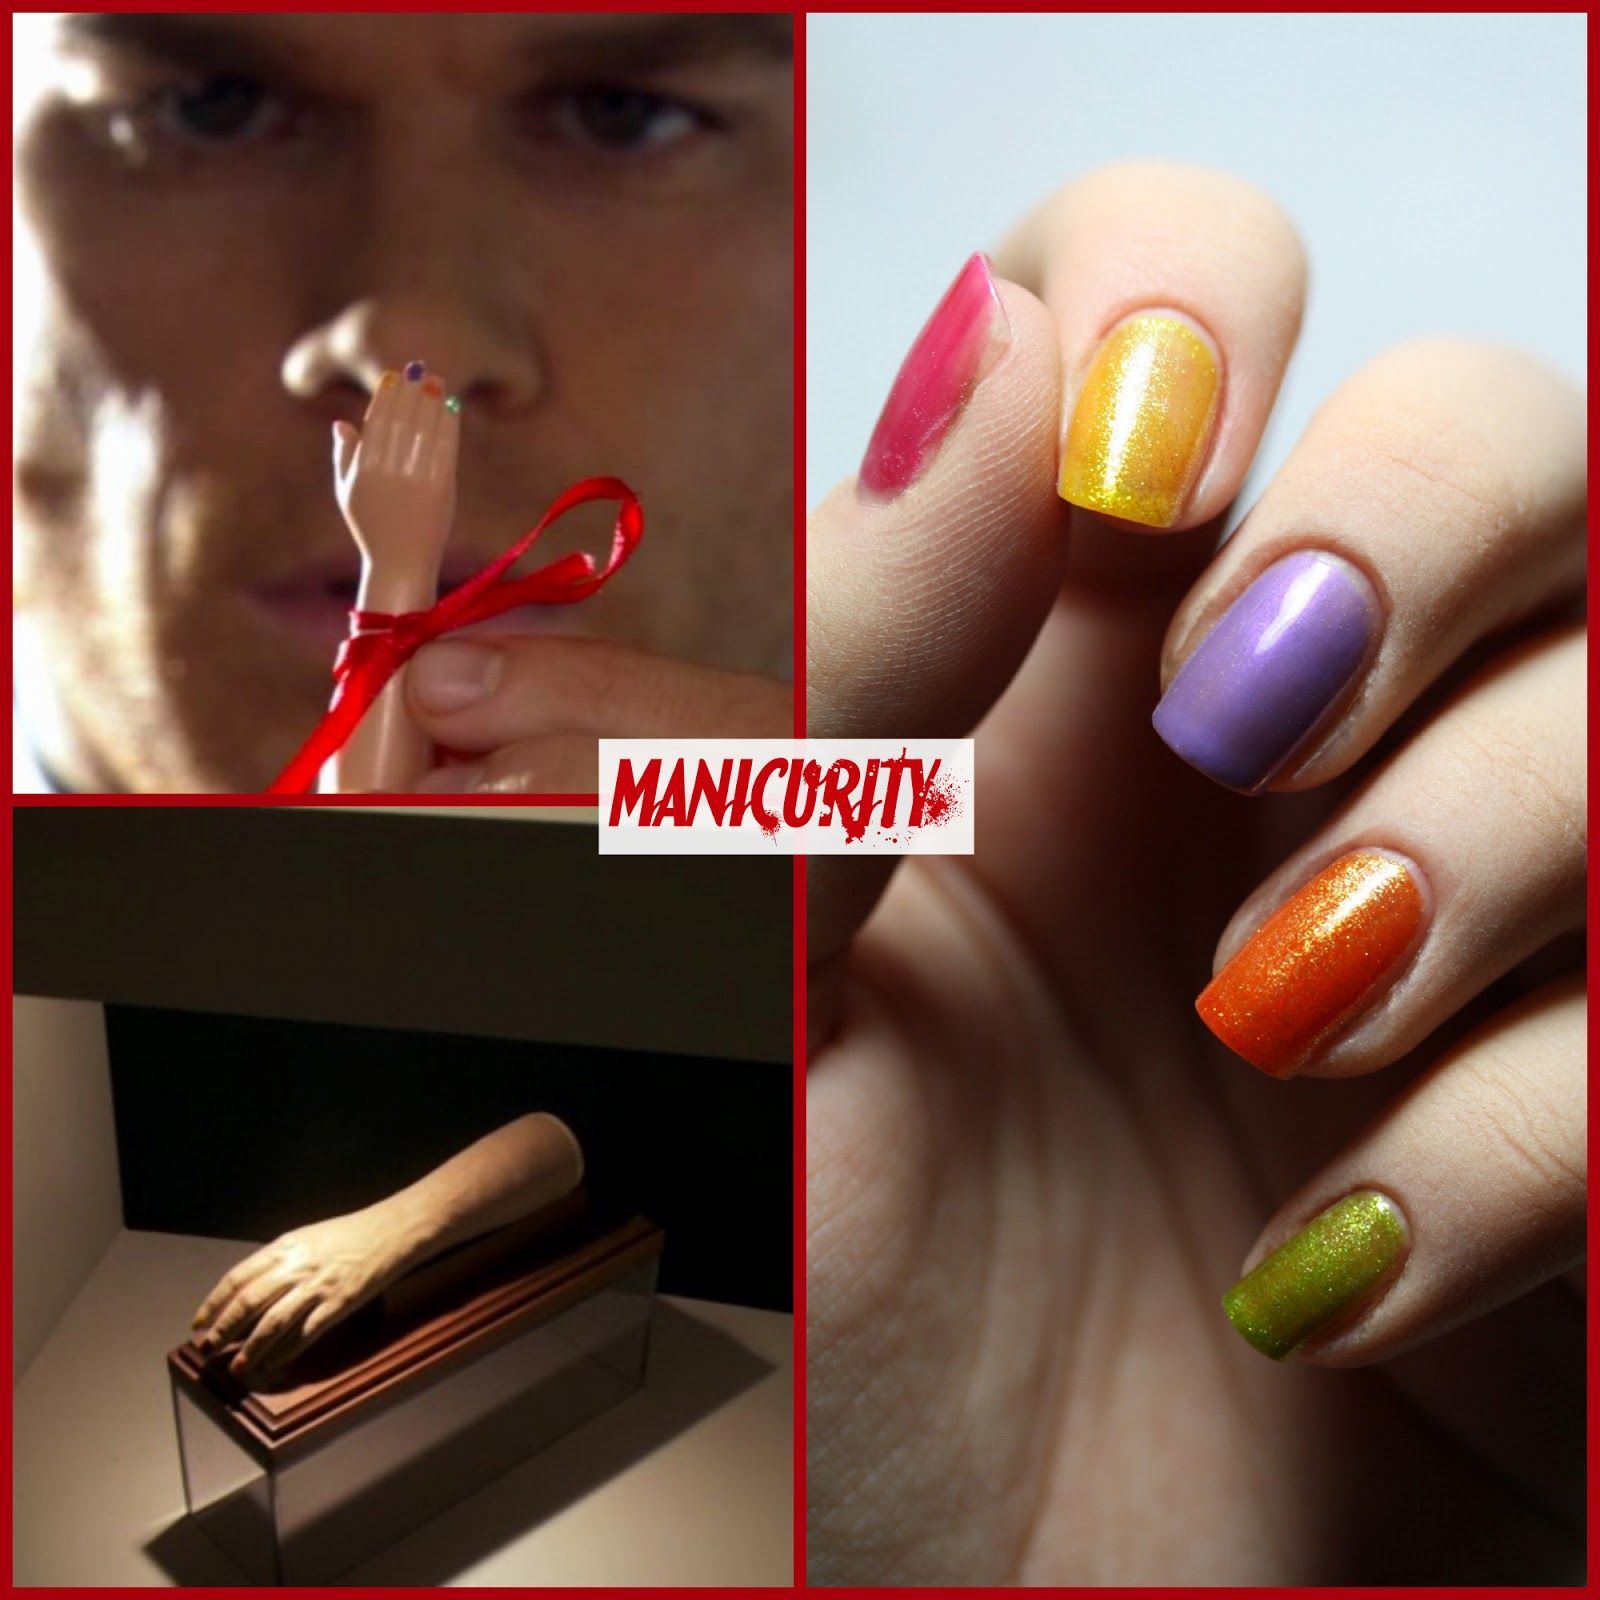 Dexter Inspired Nails From Season 1 Episode 2 Nails Nails Inspiration Bunny Nails